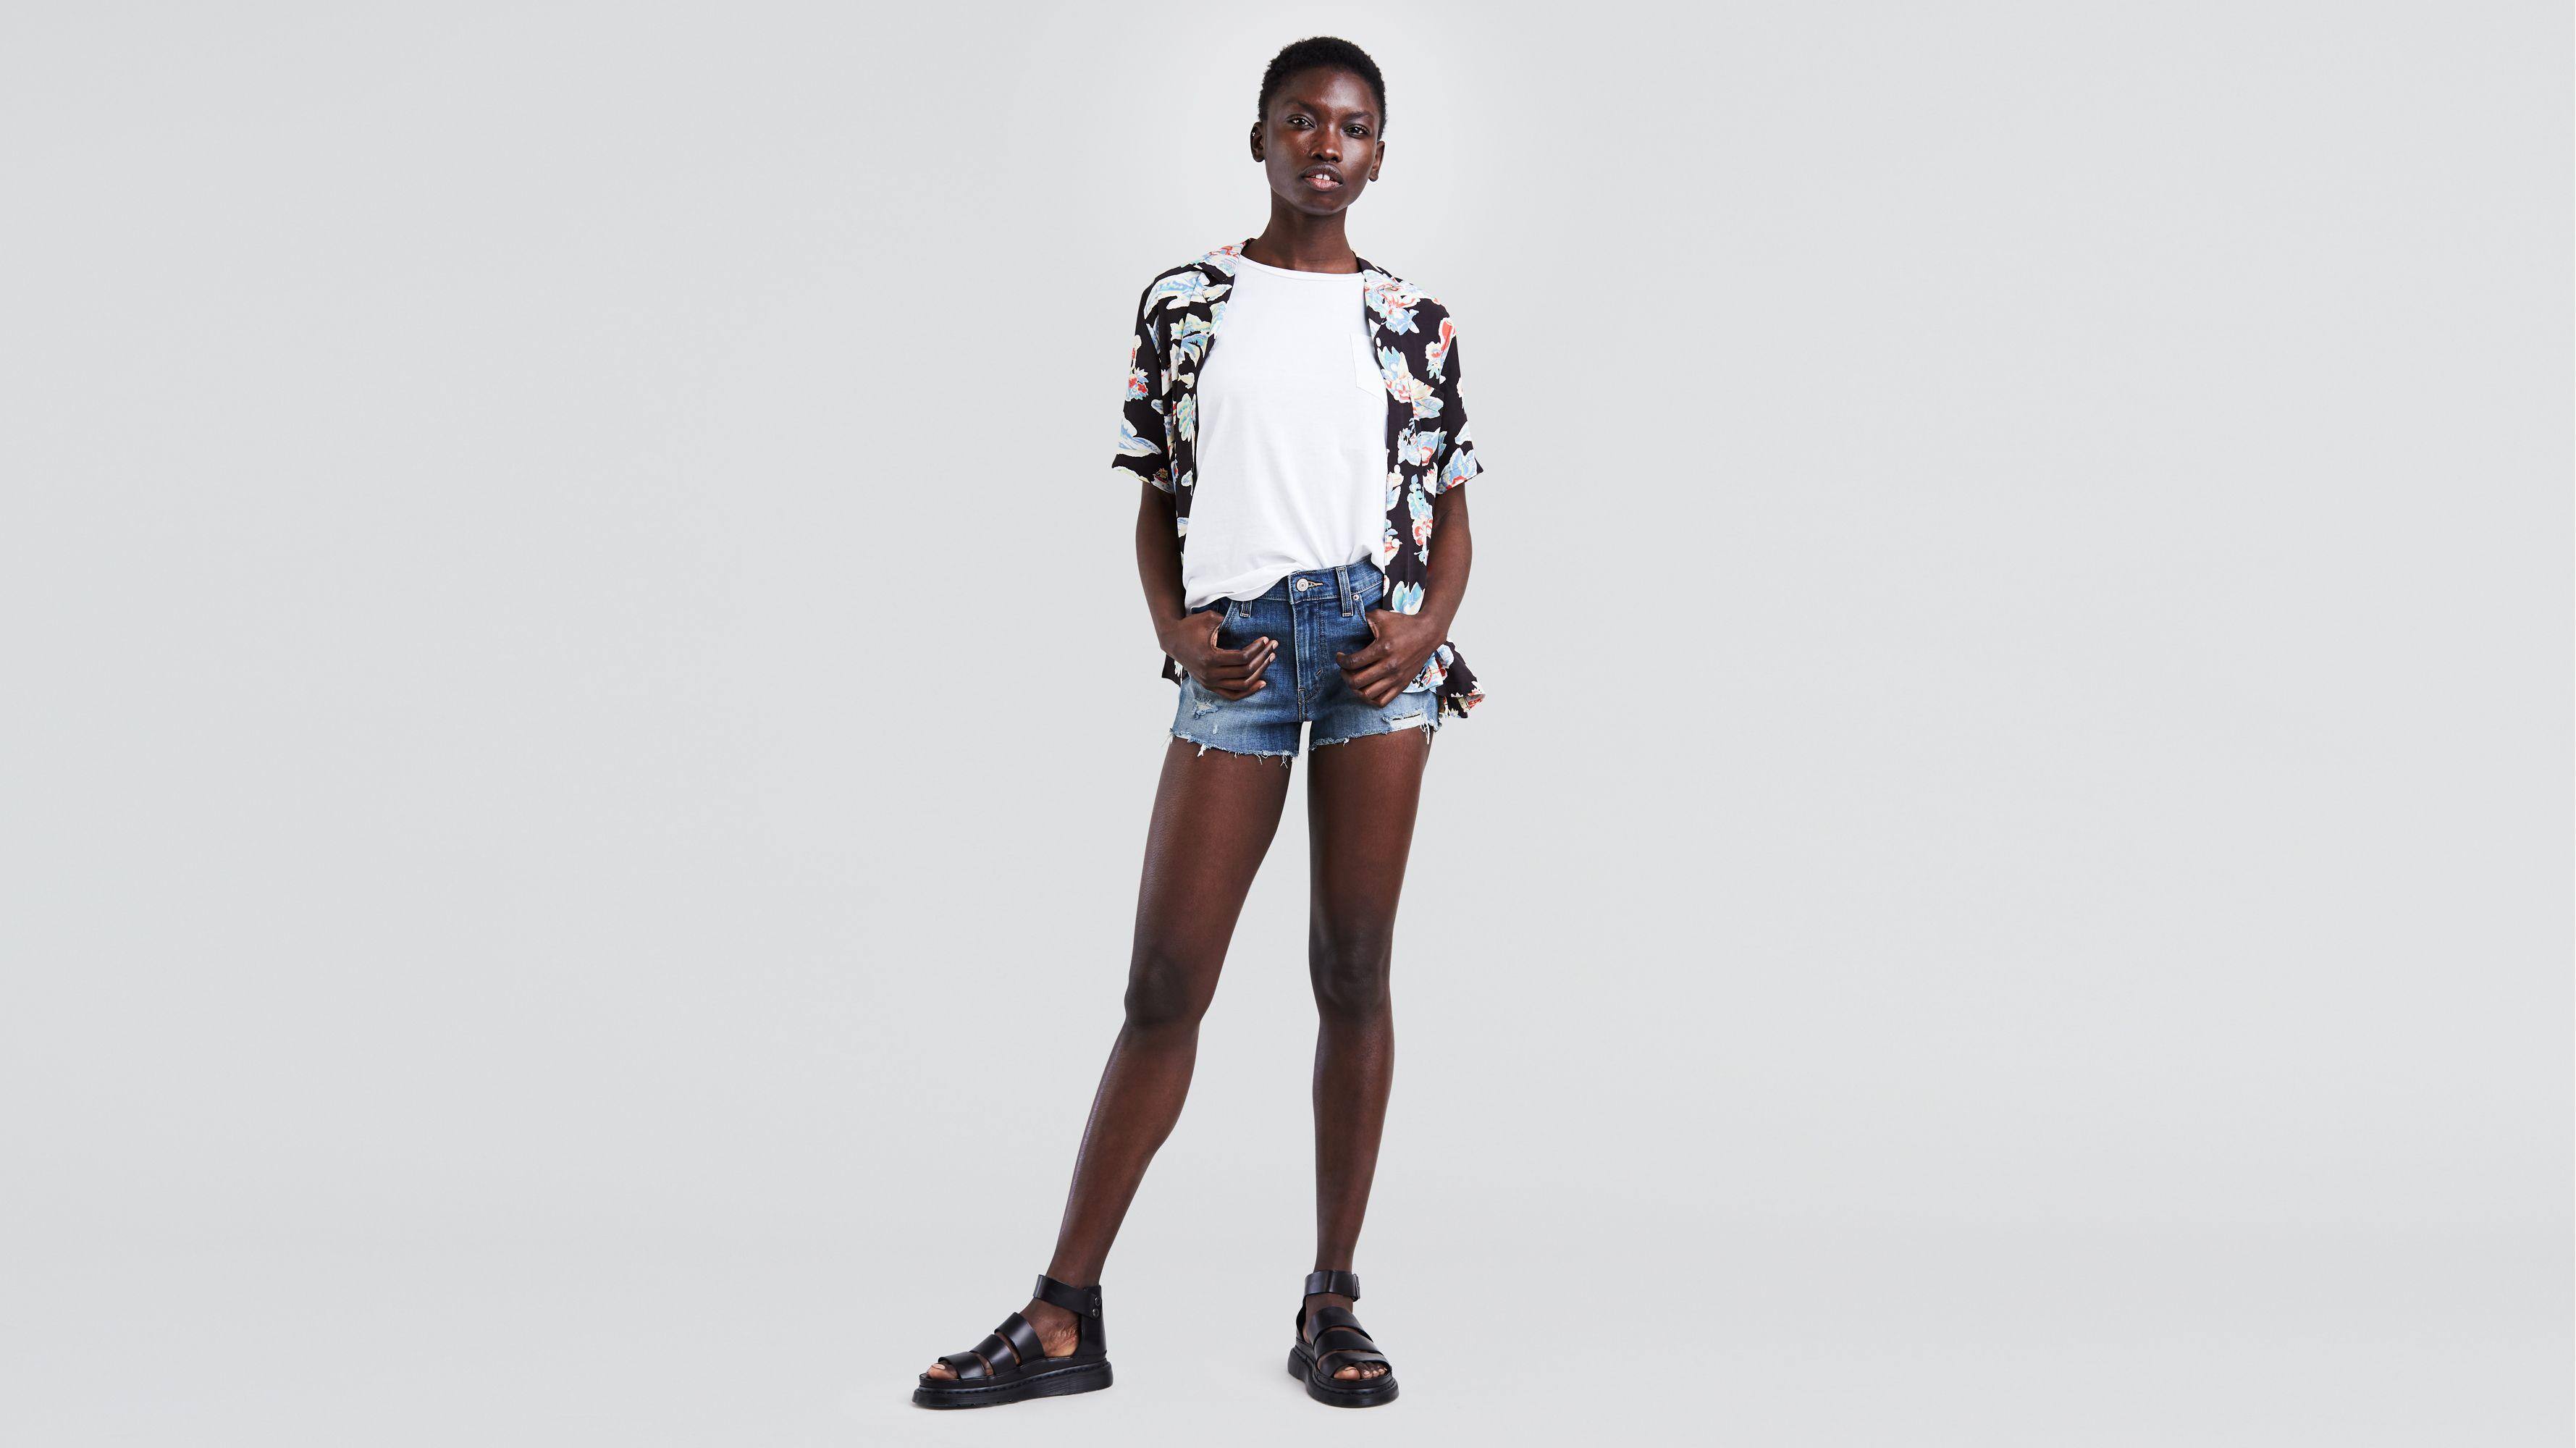 Ladies Clothing Ladies Clothing Online Online Levi's Clothing Levi's Online Levi's Ladies RwqEBpaE